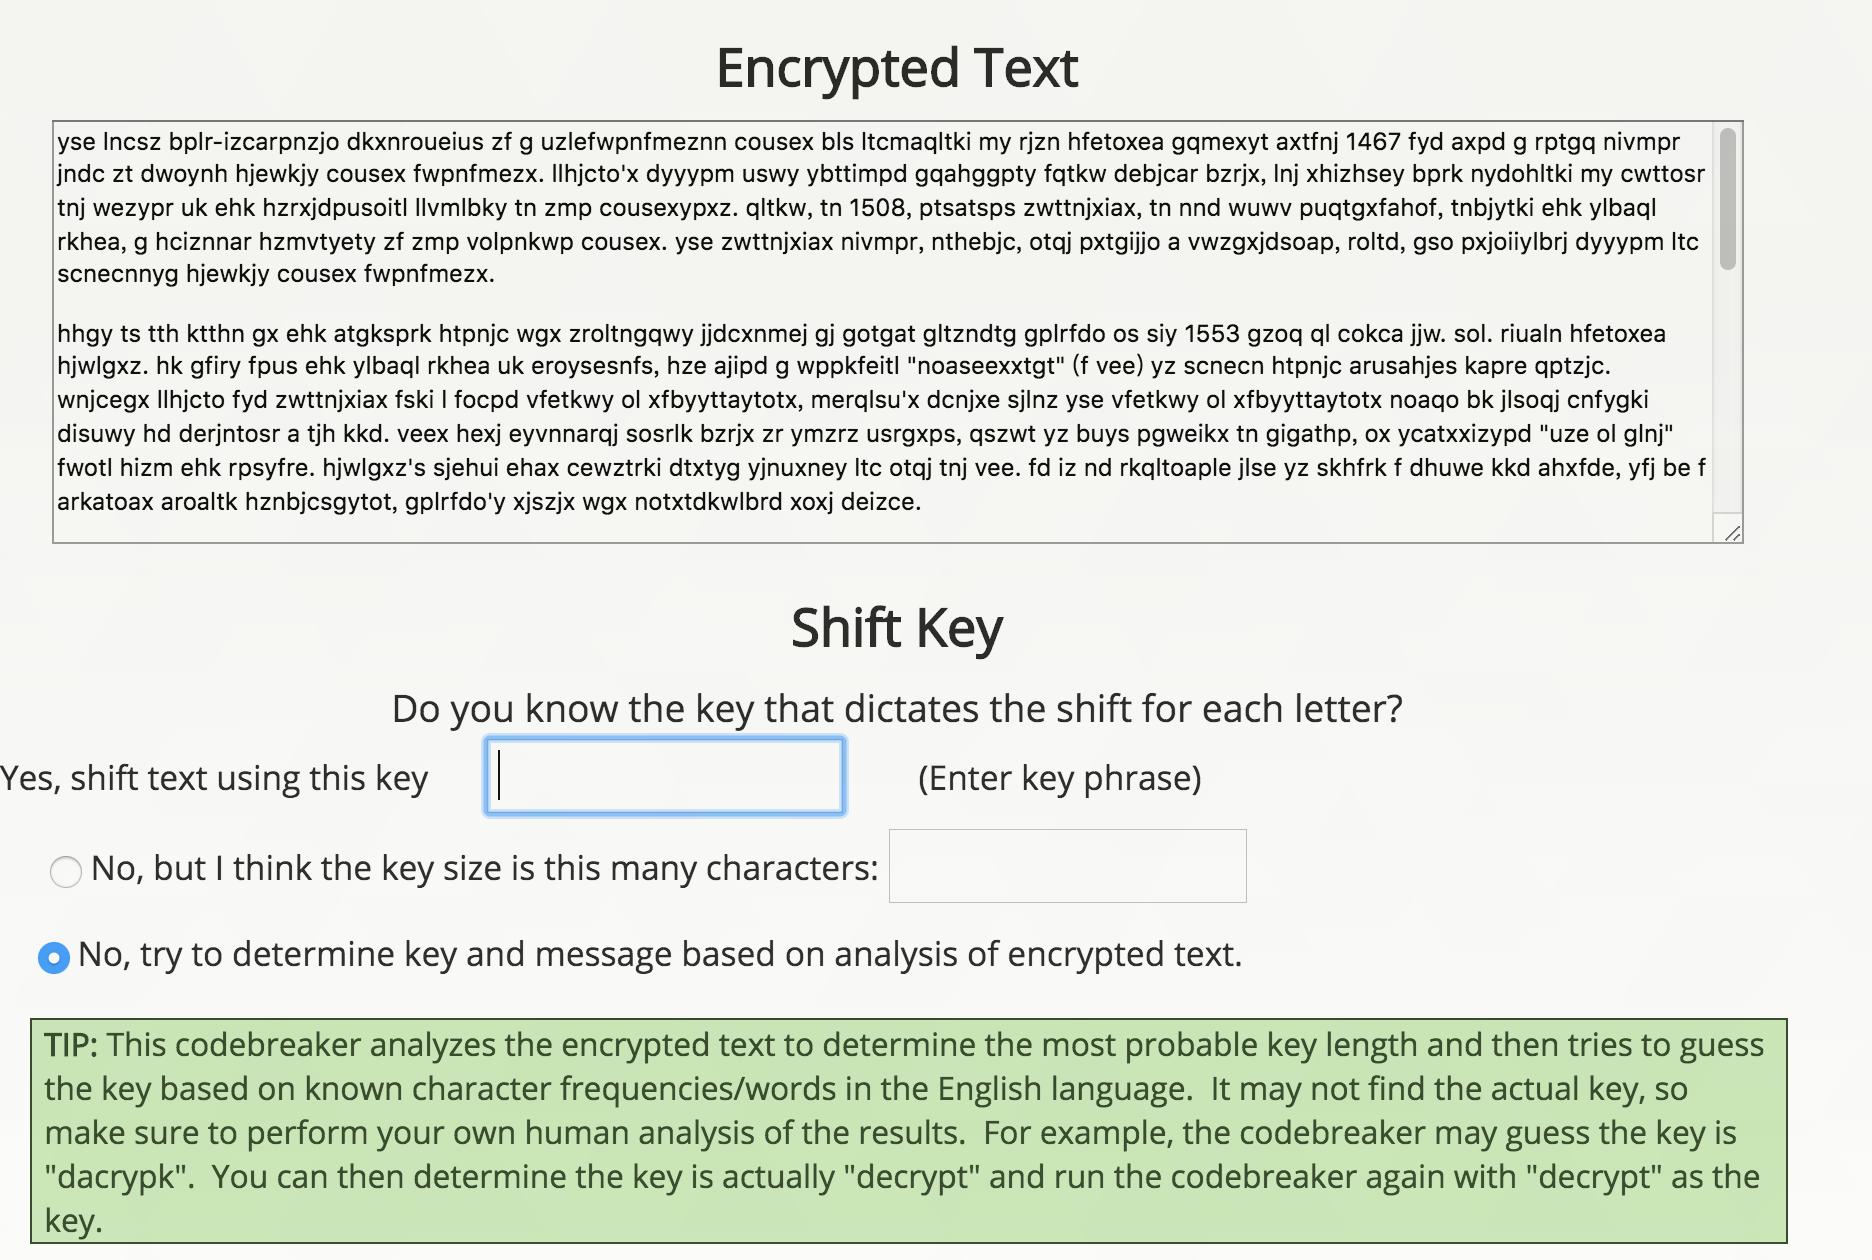 picoCTF2018 Writeup之Cryptography篇- 先知社区